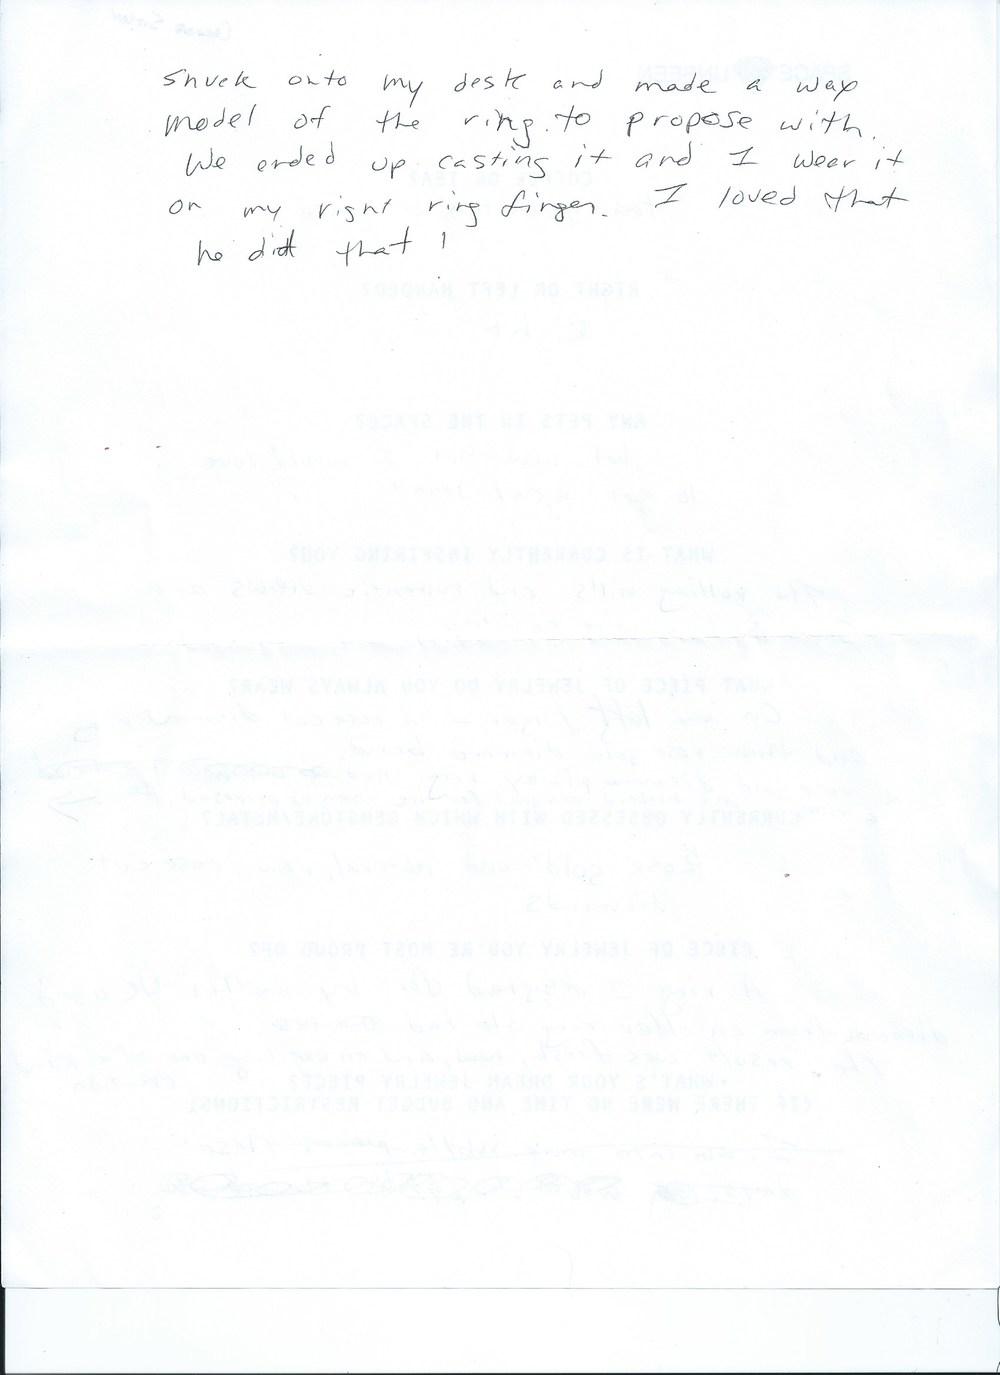 corinne simon questionnaire 2_2